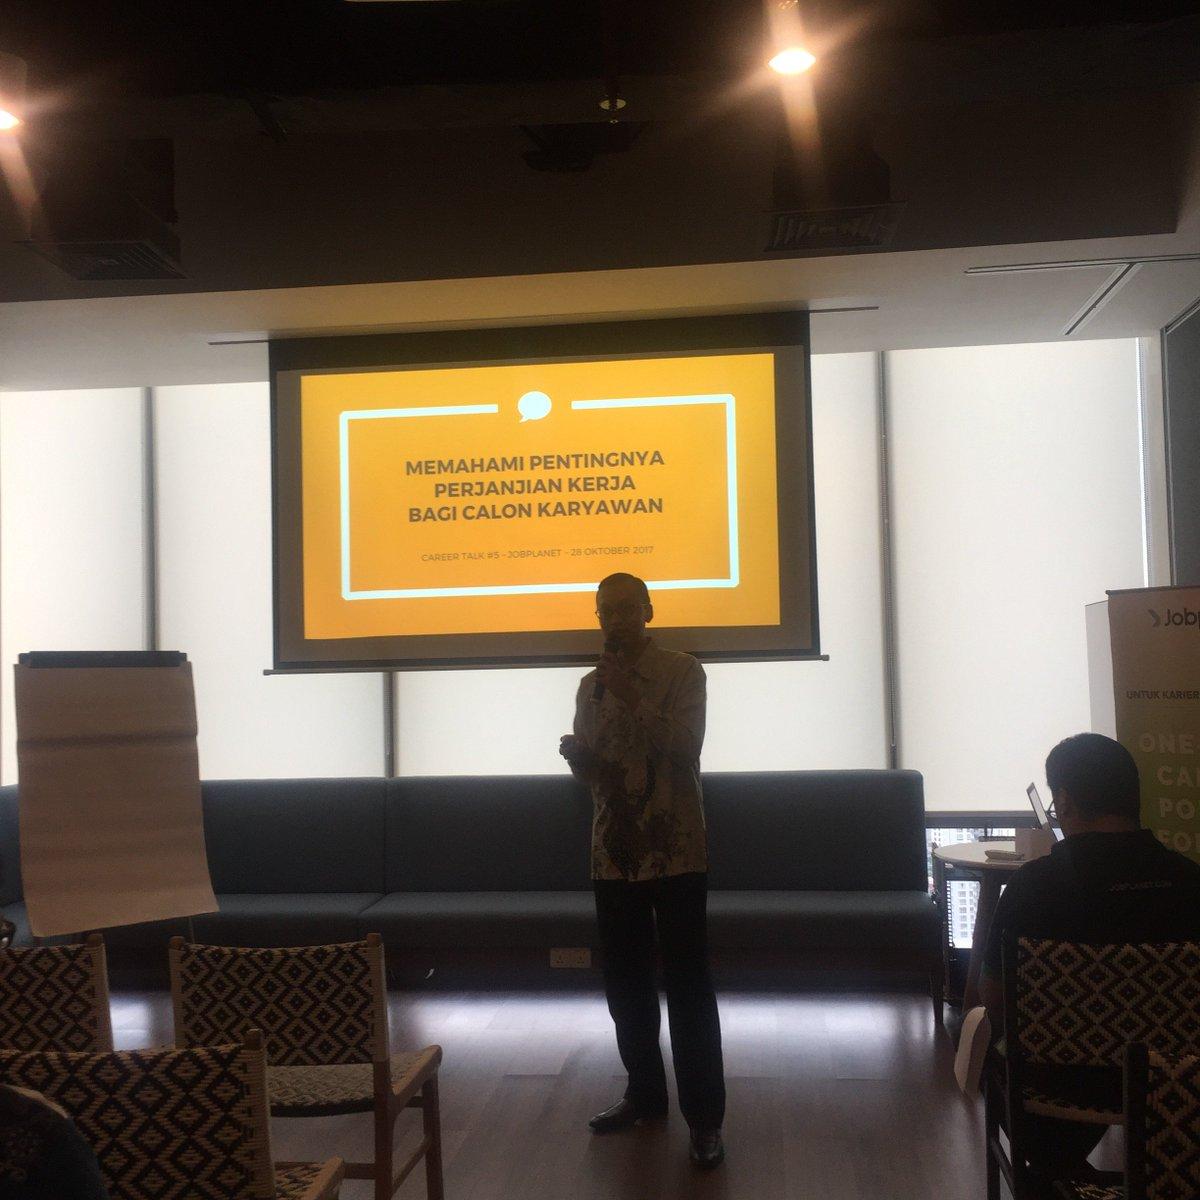 Jobplanet Career Talk #5: Memahami Pentingnya Perjanjian Kerja bagi Calon Karyawan